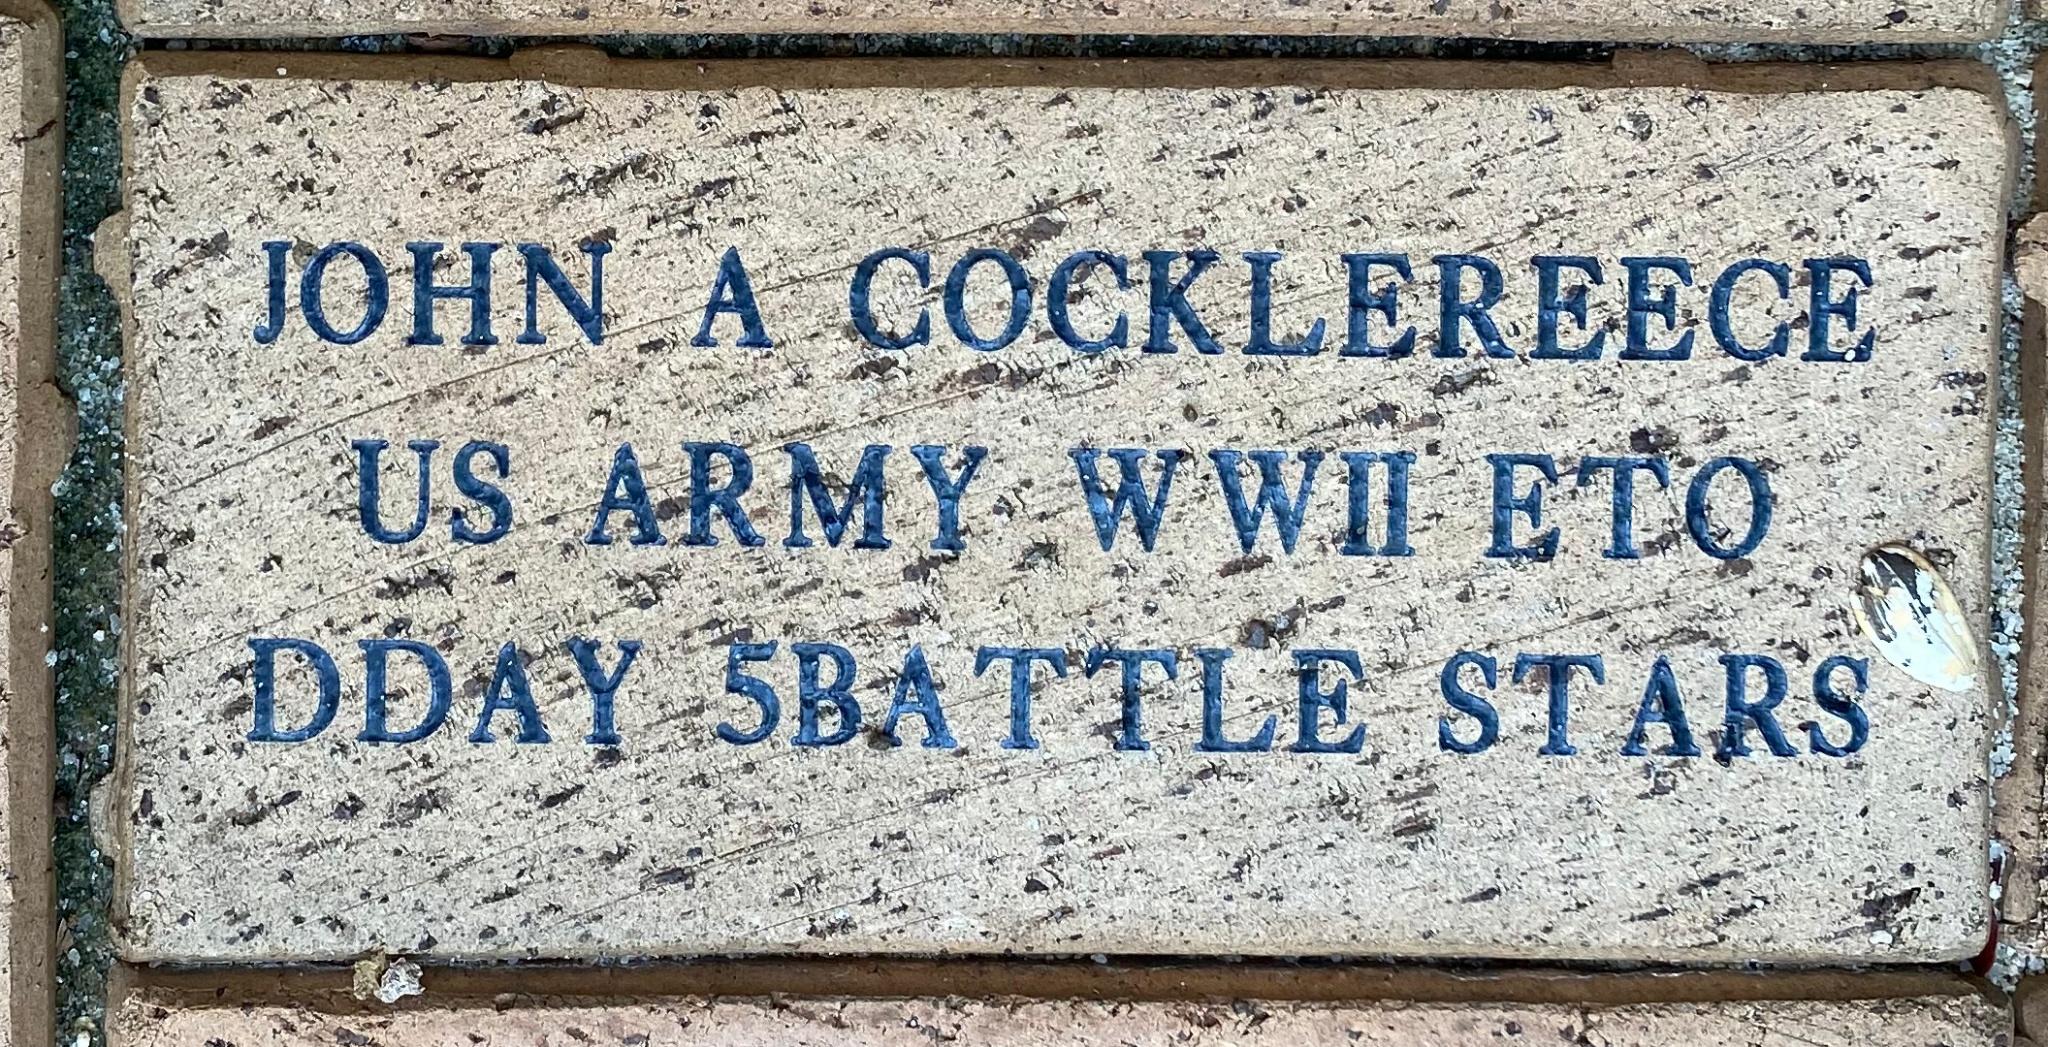 JOHN A COCKLEREECE US ARMY WWII ETO DDAY 5 BATTLE STARS